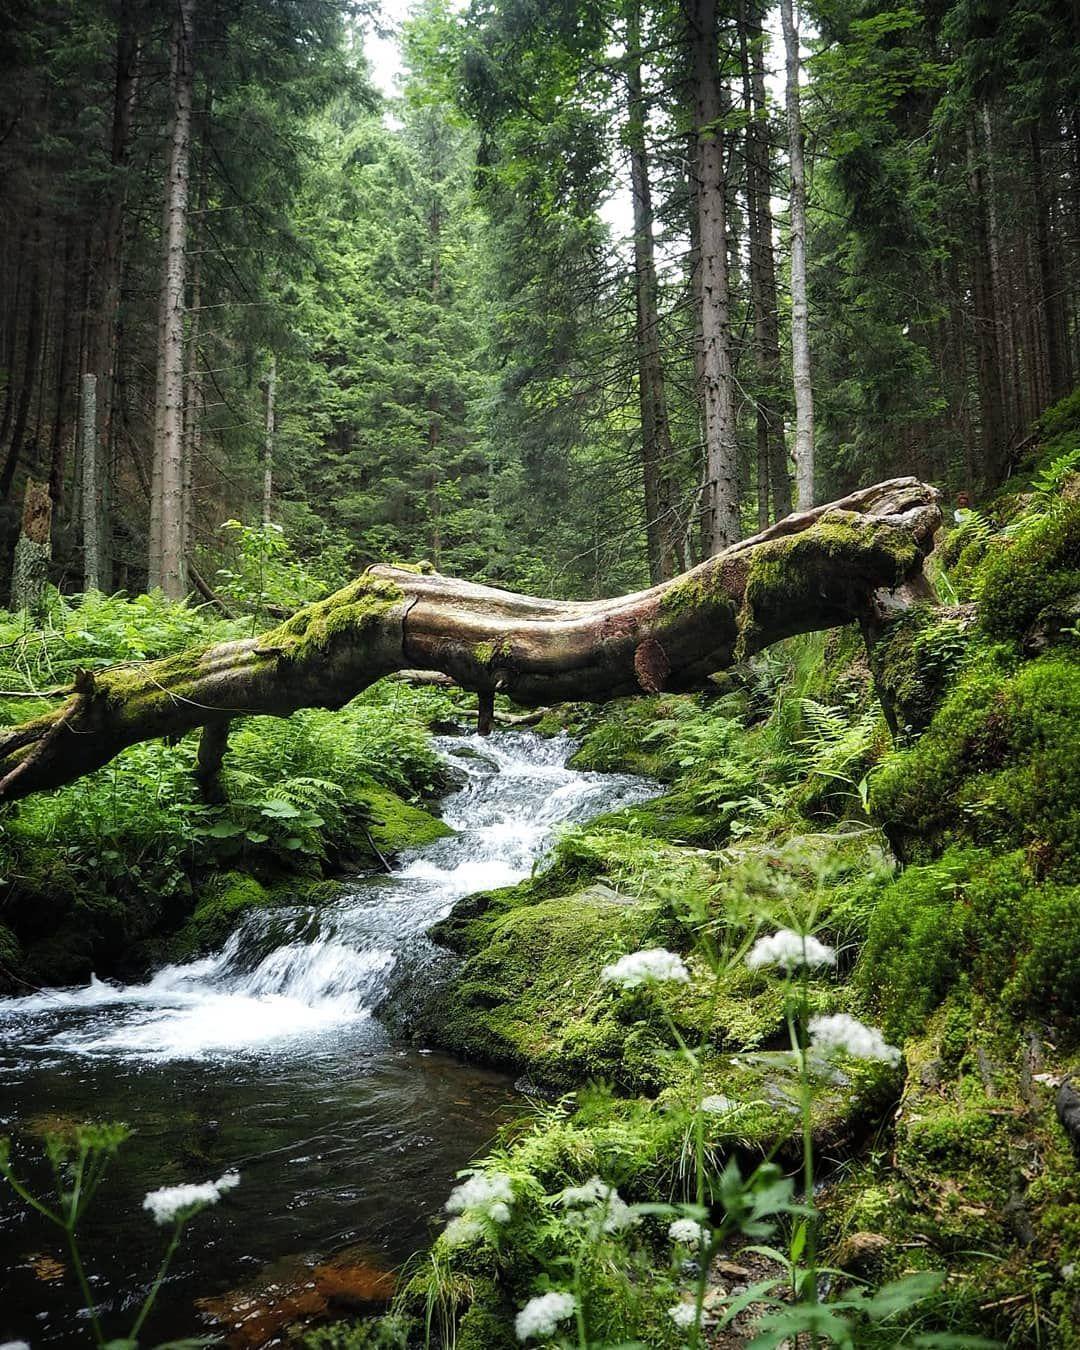 #greenworld#travelphotography#wildandfree#lostinthewoods#travelsoul👣🌍🌲#beautifulczechnature#lovelywondering#dnescestujem#vodopadybileopavy#cestujemczsk